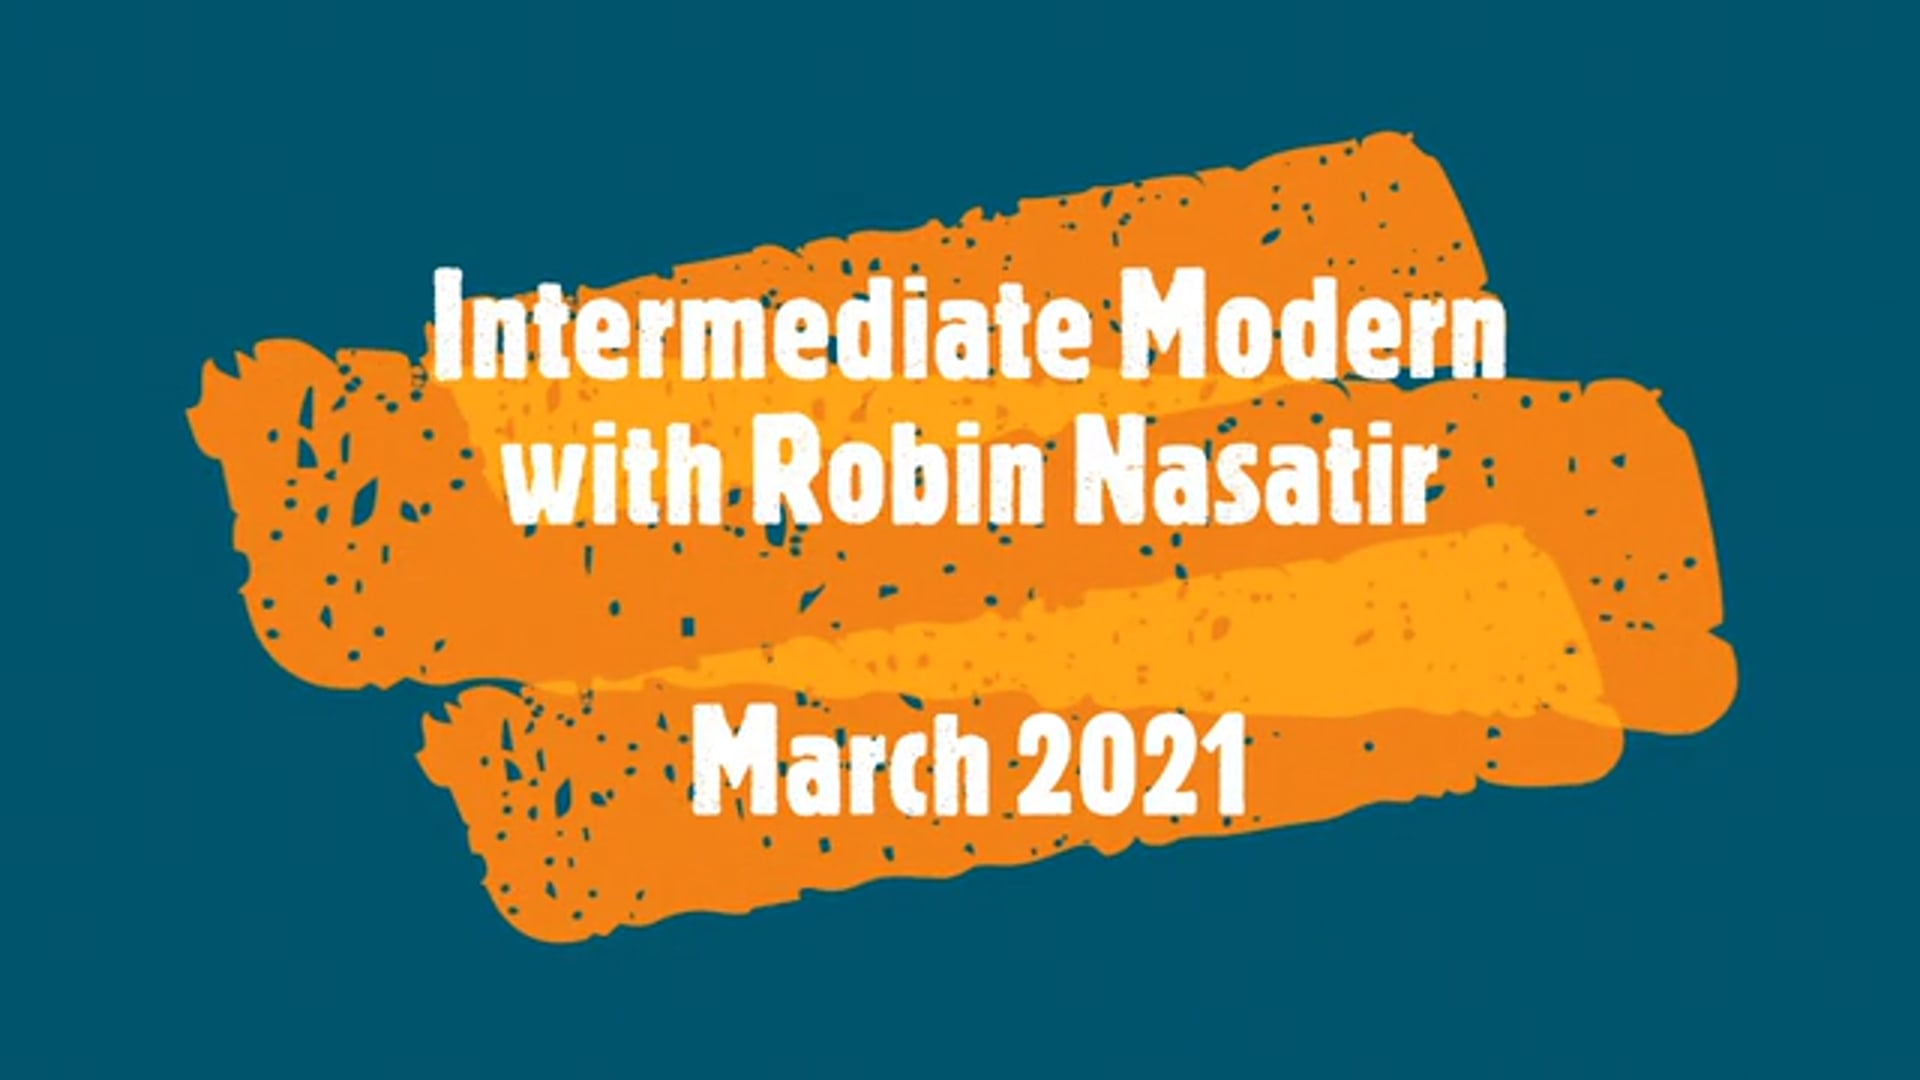 March 2021 Intermediate Modern Dance for 50+